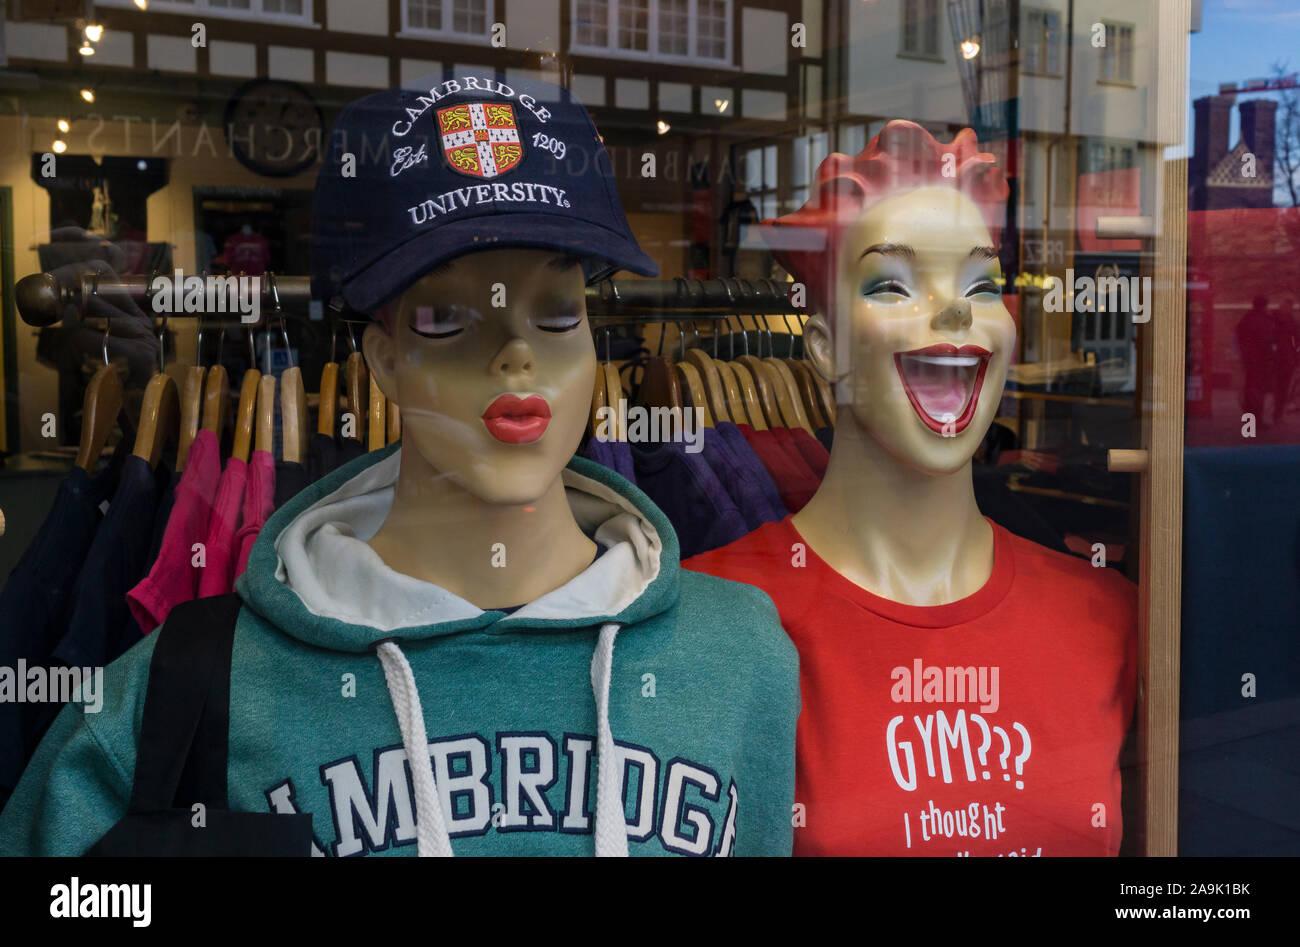 ghoulish-mannequins-in-shop-window-2A9K1BK.jpg